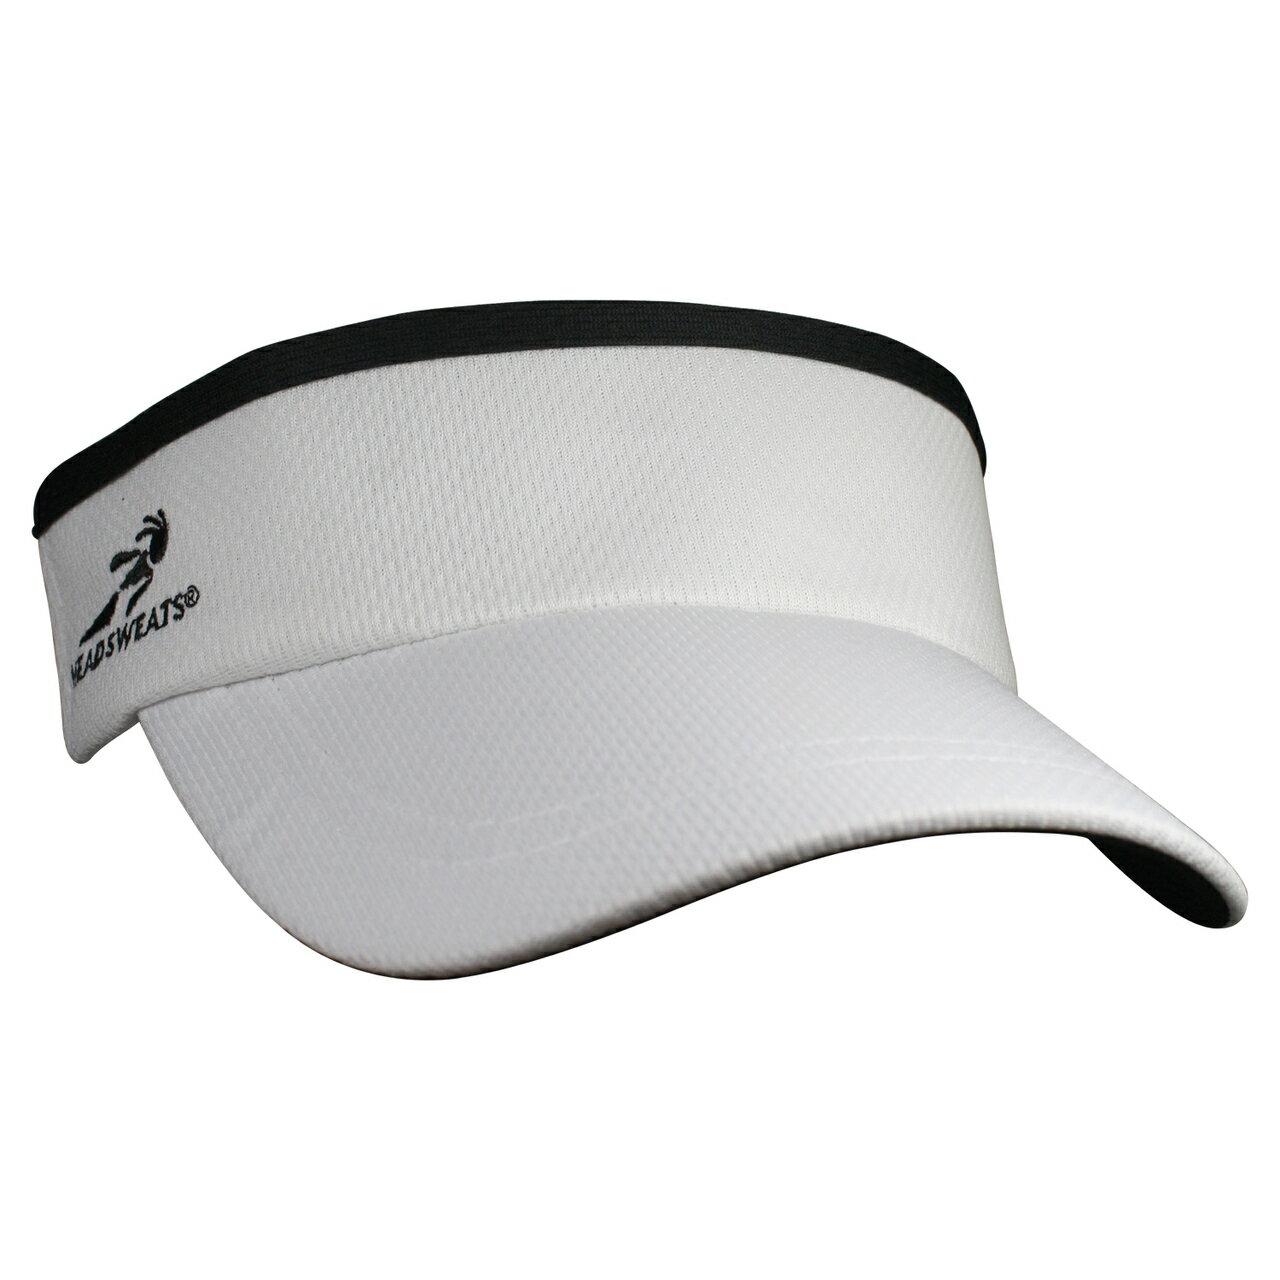 HEADSWEATS 汗淂 Supervisor 遮陽帽 (白色)